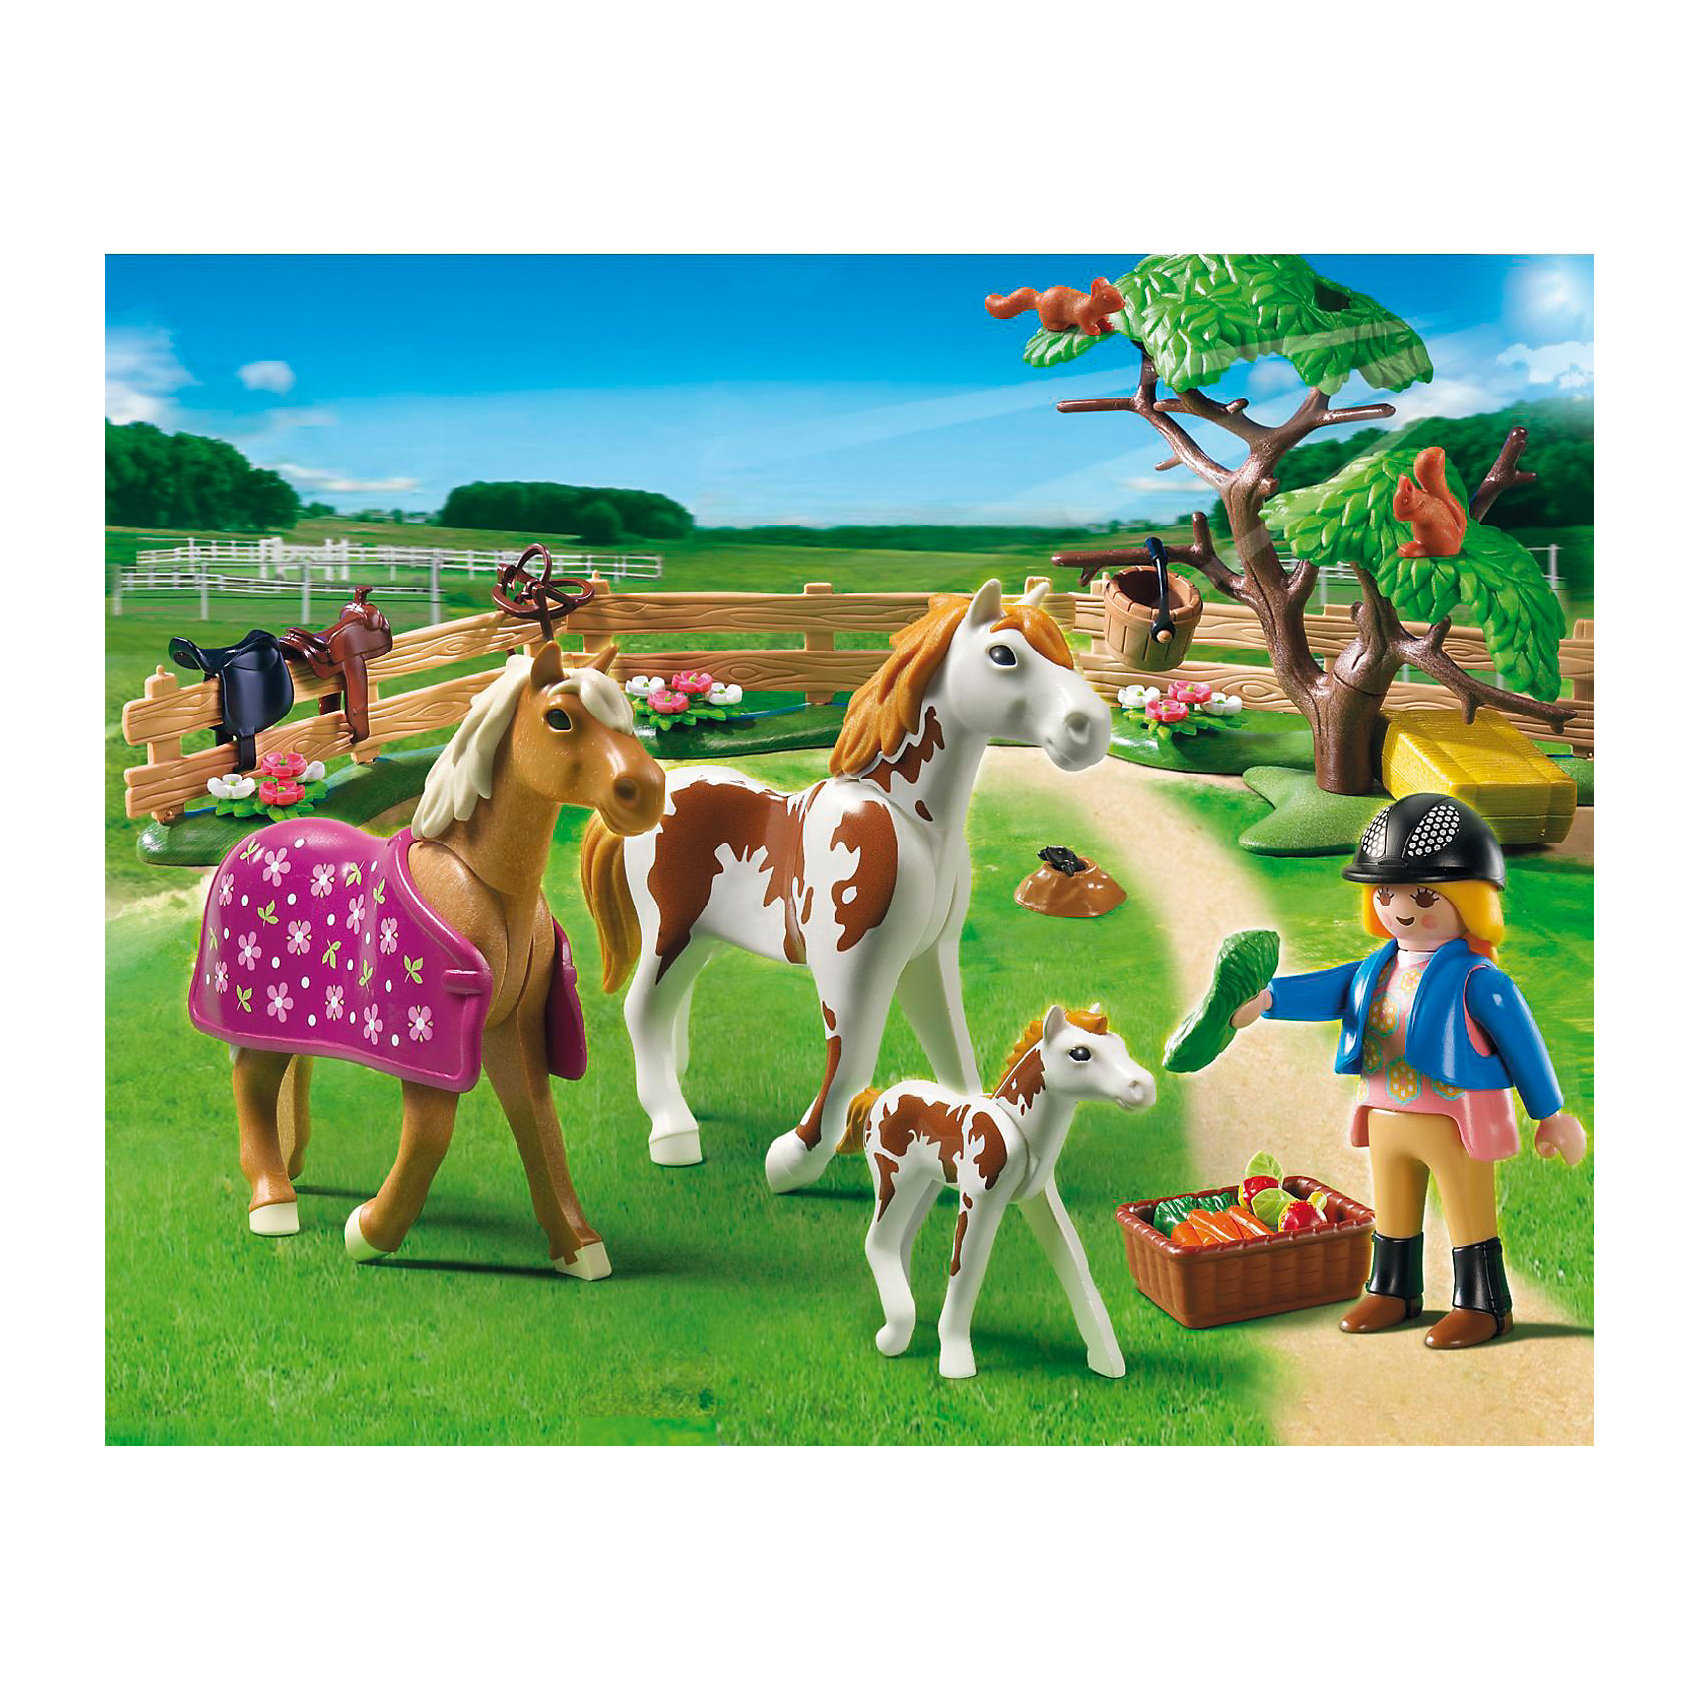 Лошади: Загон для лошадей, PLAYMOBIL